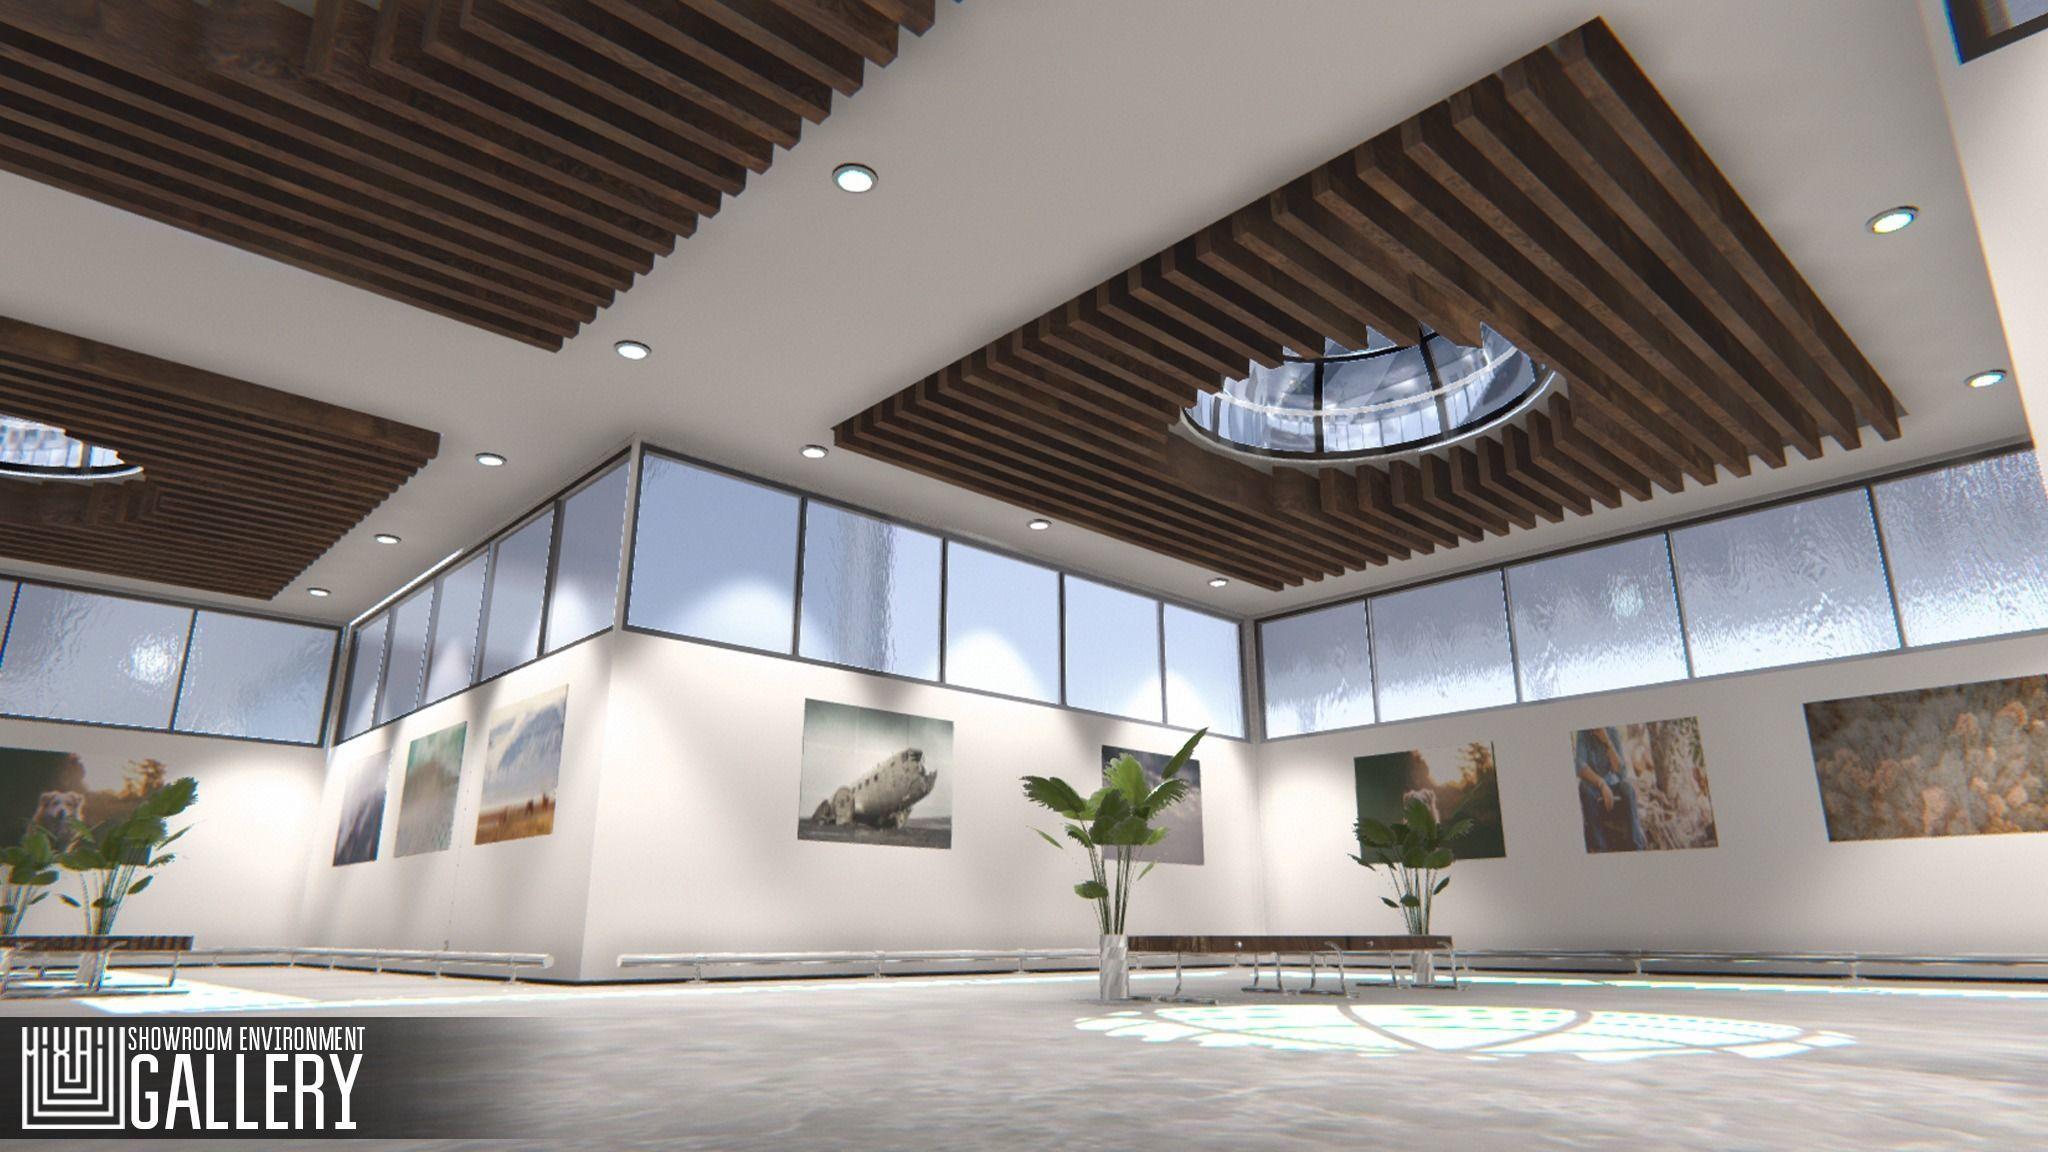 Showroom Environment - gallery